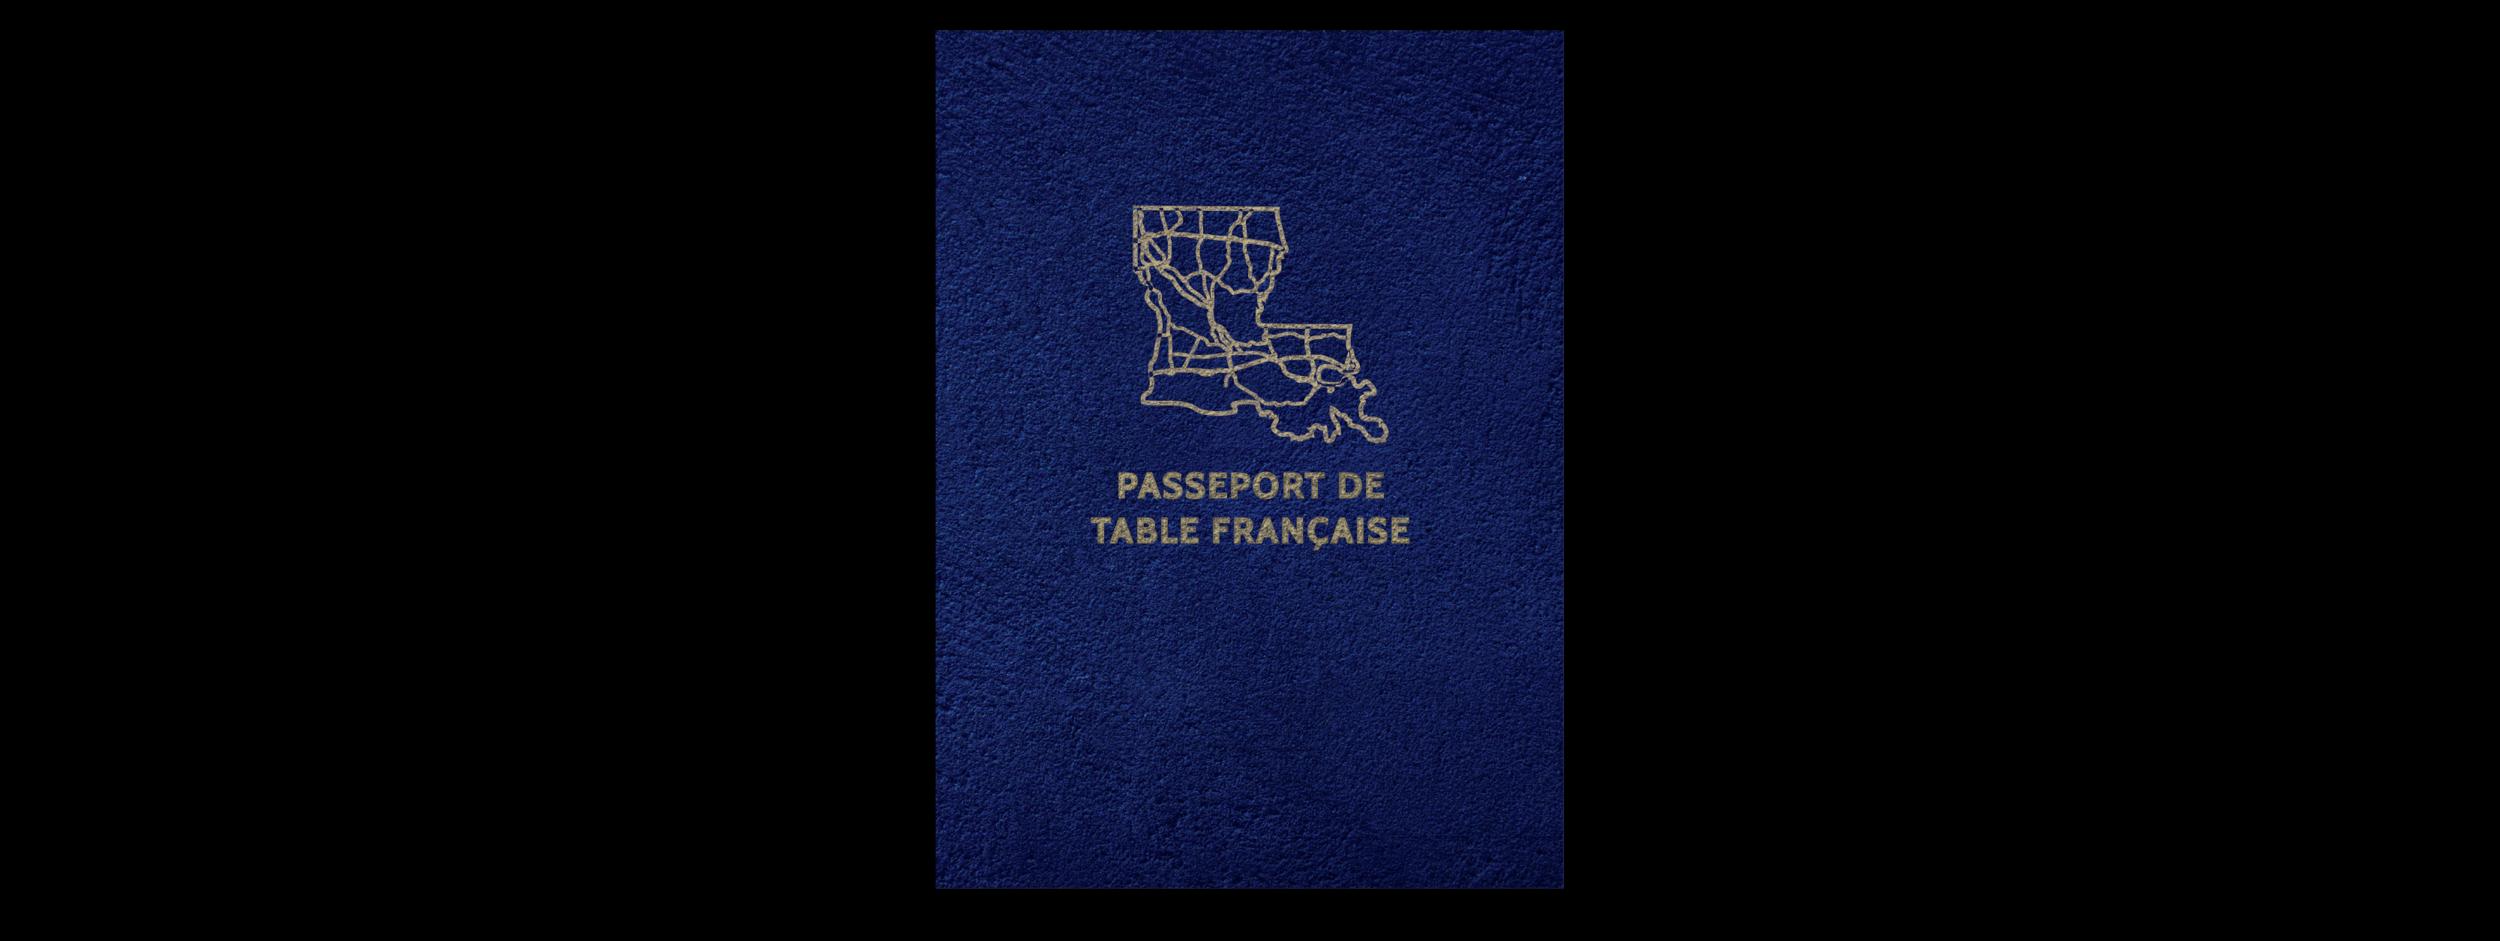 passportlarger-01.png